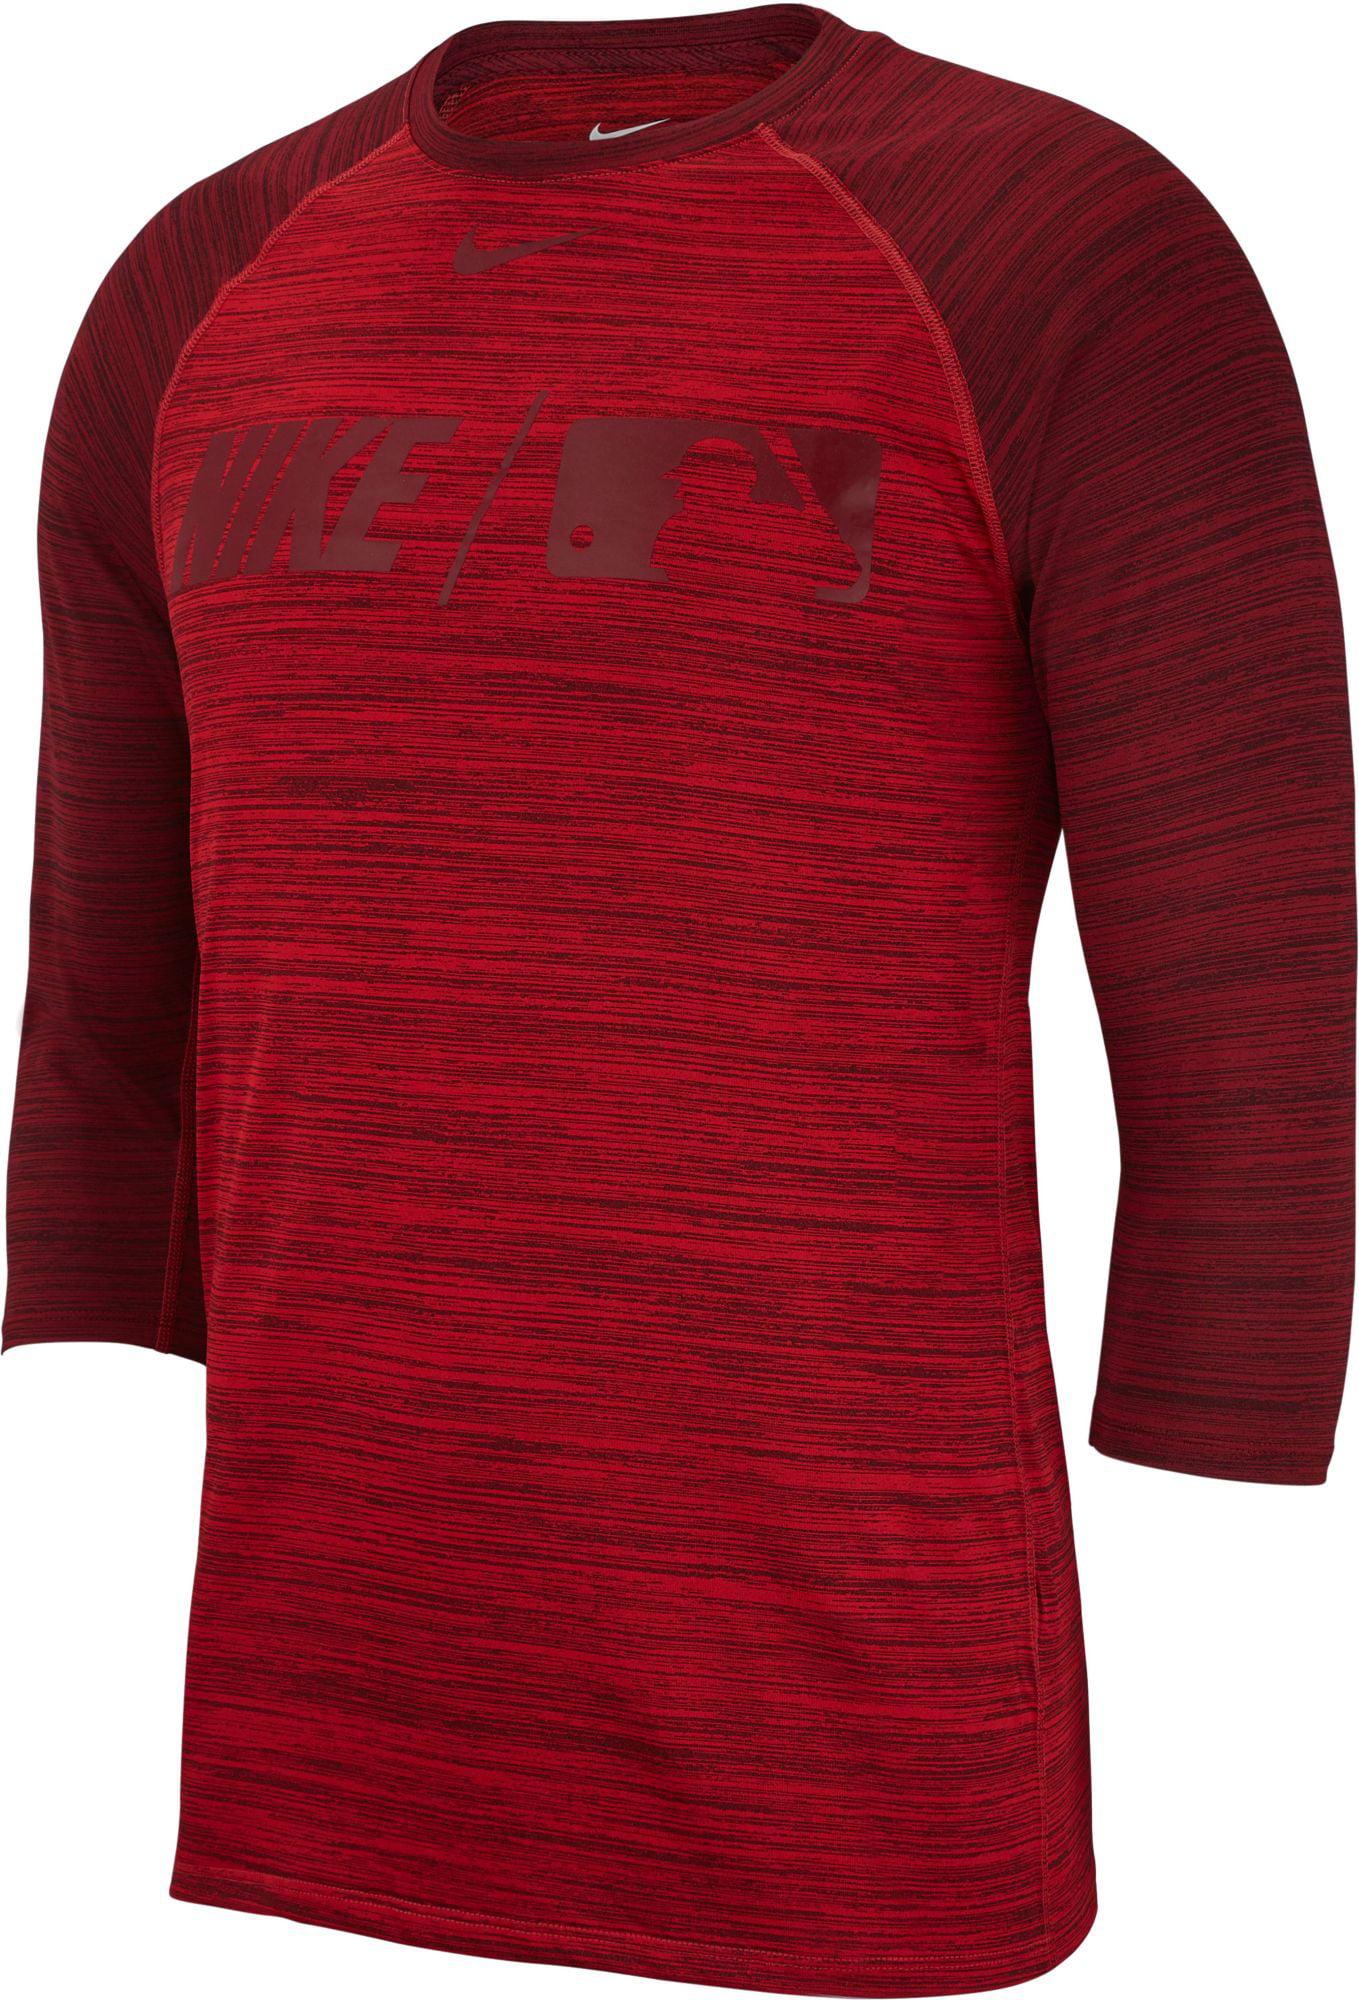 cupón reinado Interpretativo  Nike - Nike Men's Dry MLB 3/4 Sleeve Baseball T-Shirt - Walmart.com -  Walmart.com